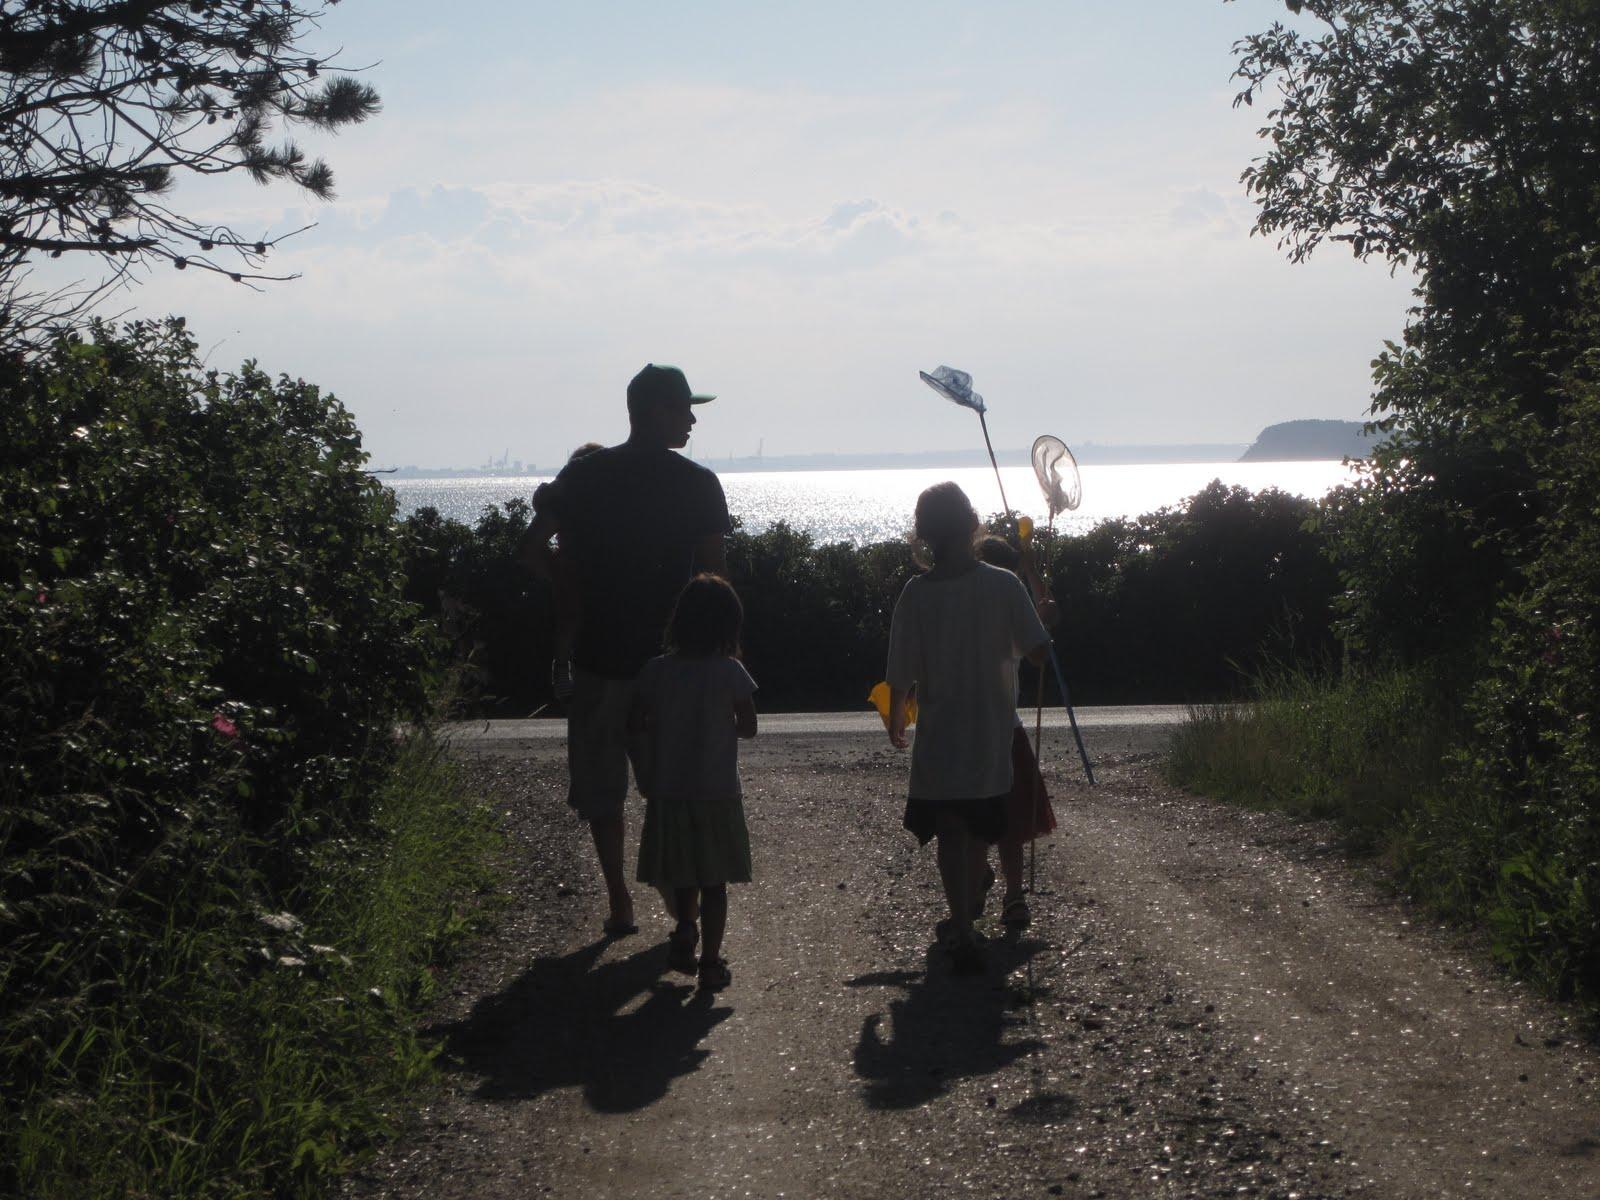 wpid-juni-juli-2011-203.jpg.jpeg